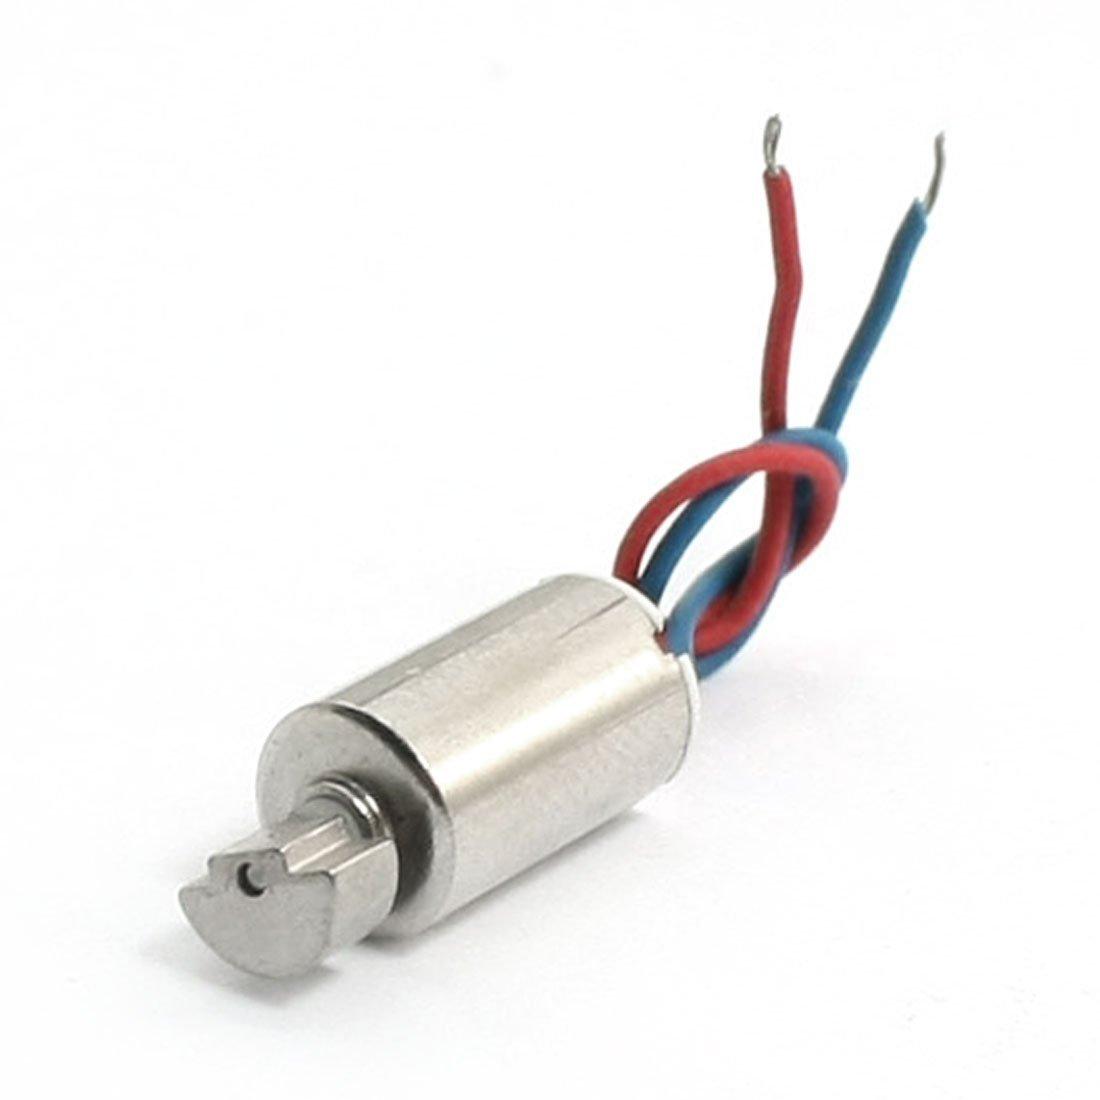 Uxcell DC 0.9-1.6V 9000R//Min High Torque Micro Vibration Motor // Uxcell a13111900ux0509 5mm Shaft Dragonmarts Co Ltd